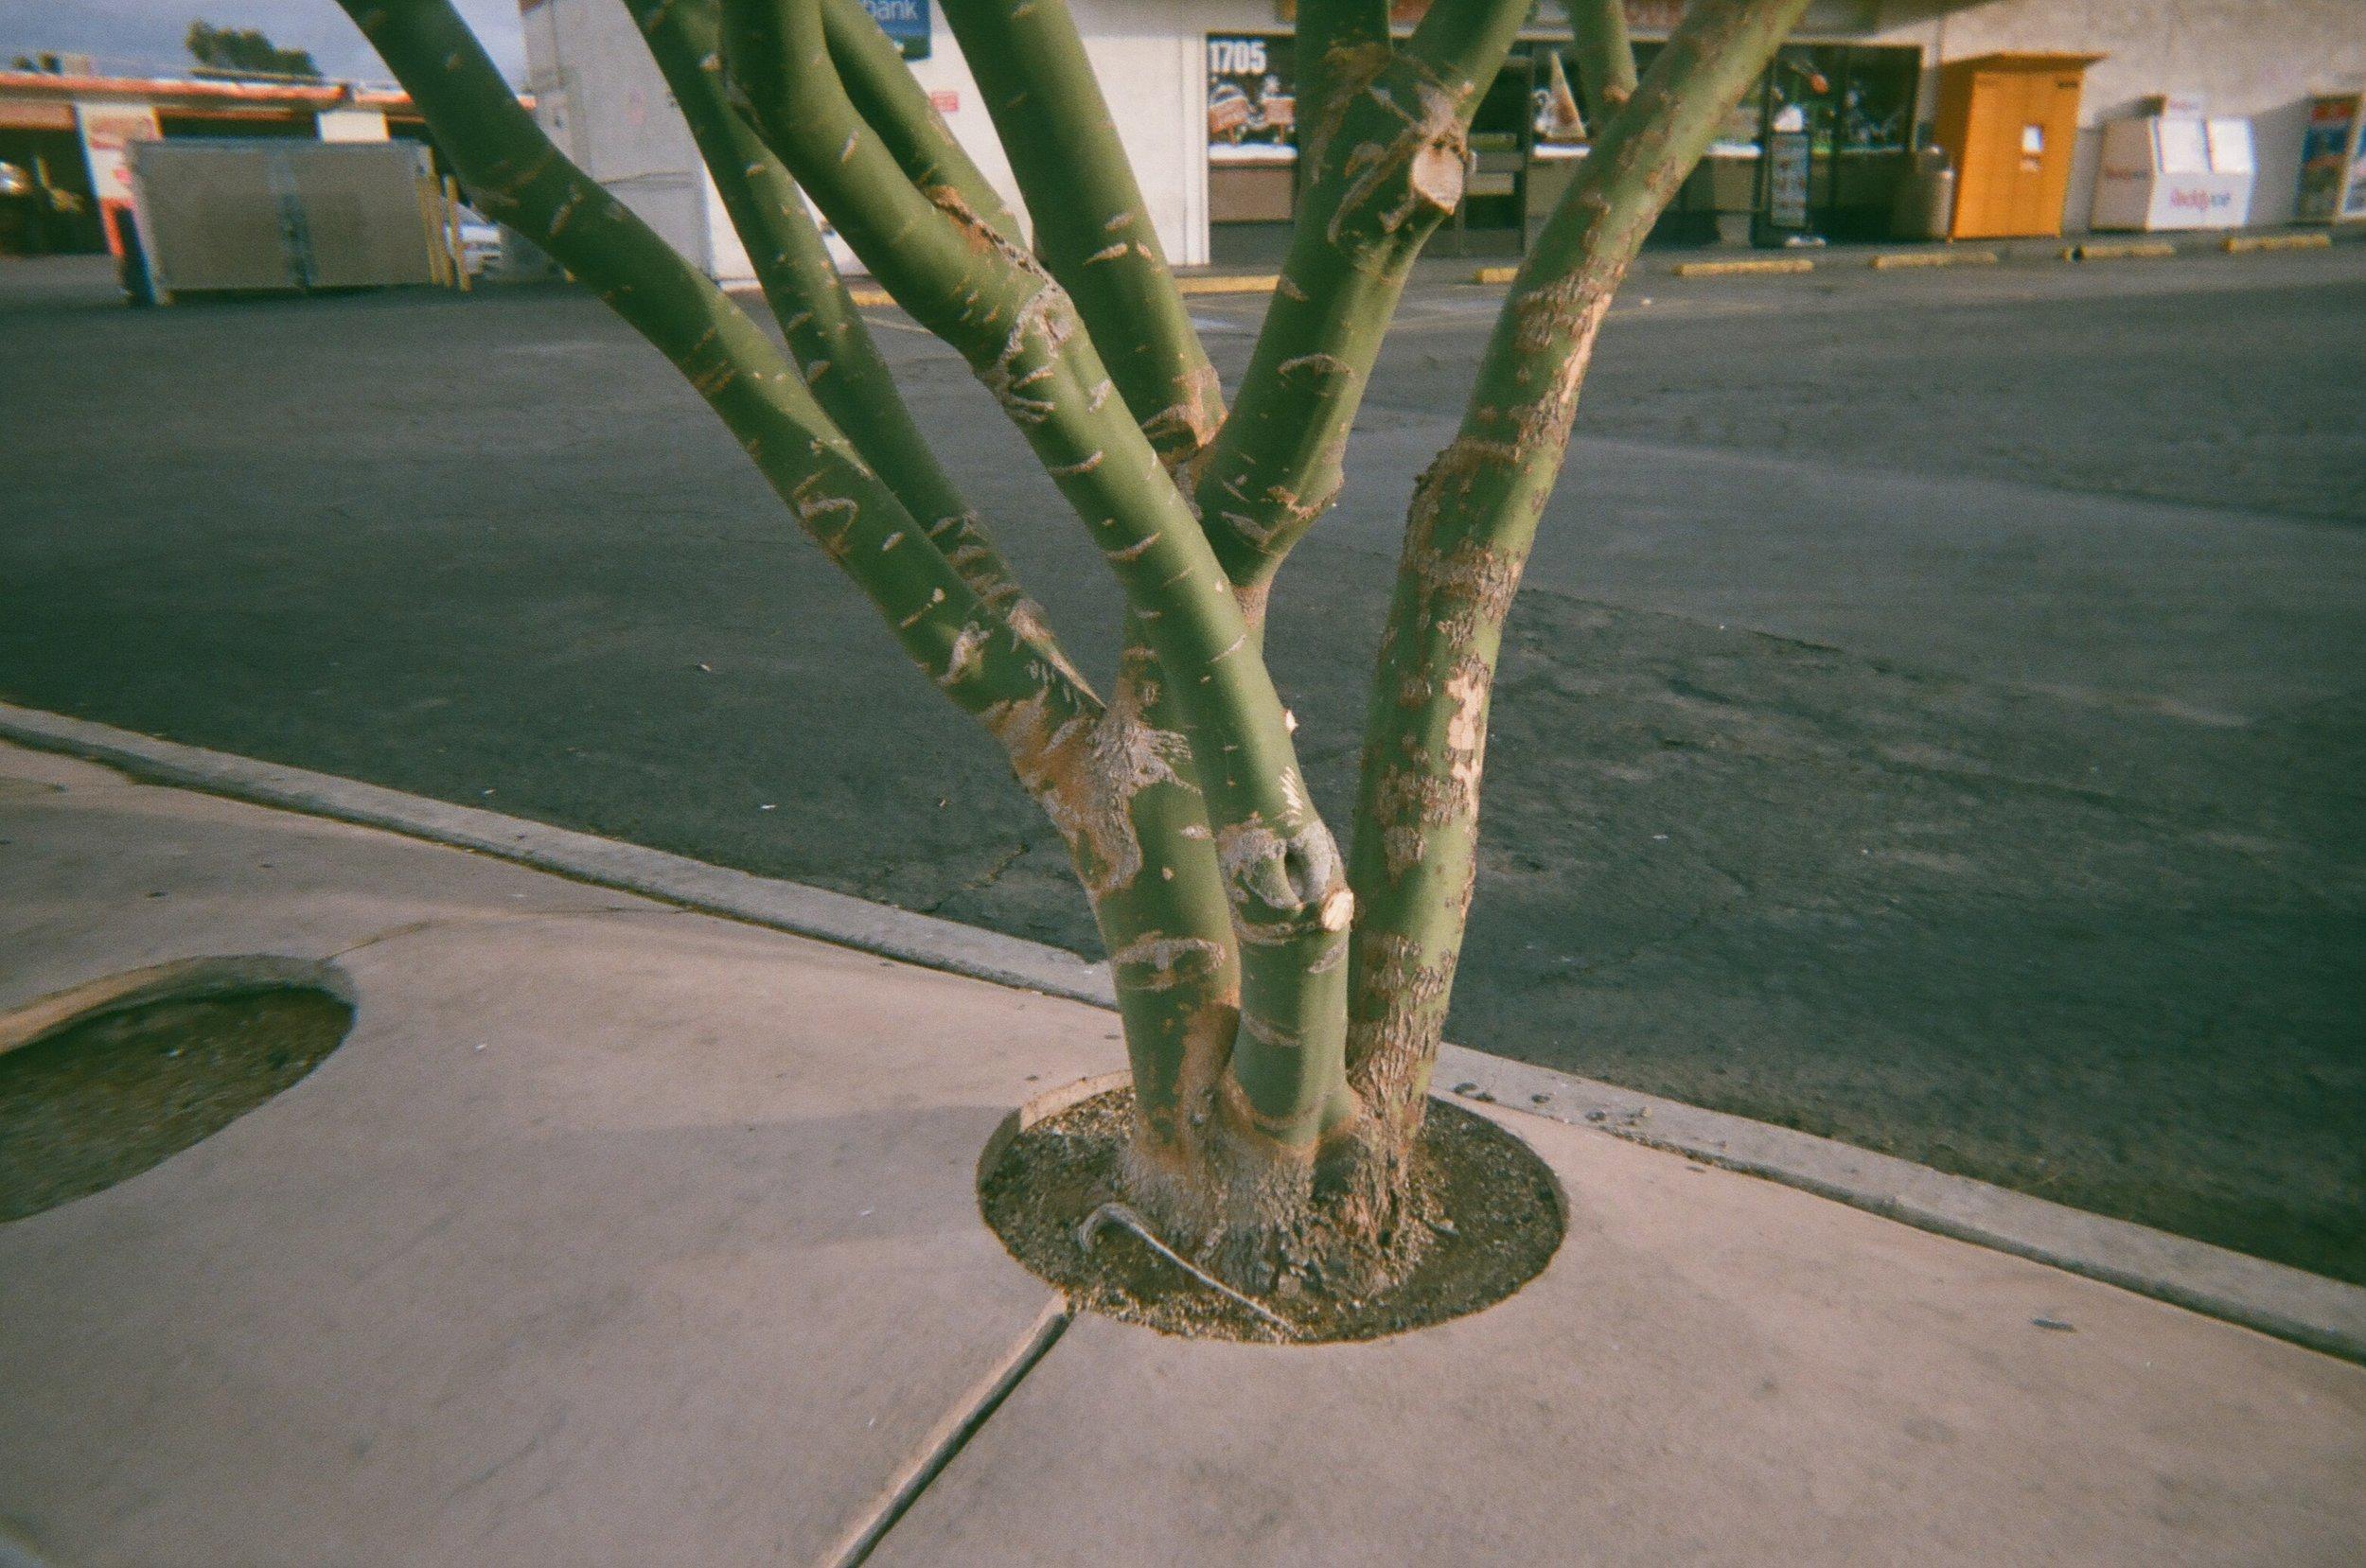 Las-Vegas-Off-the-Strip-Disposable-Film